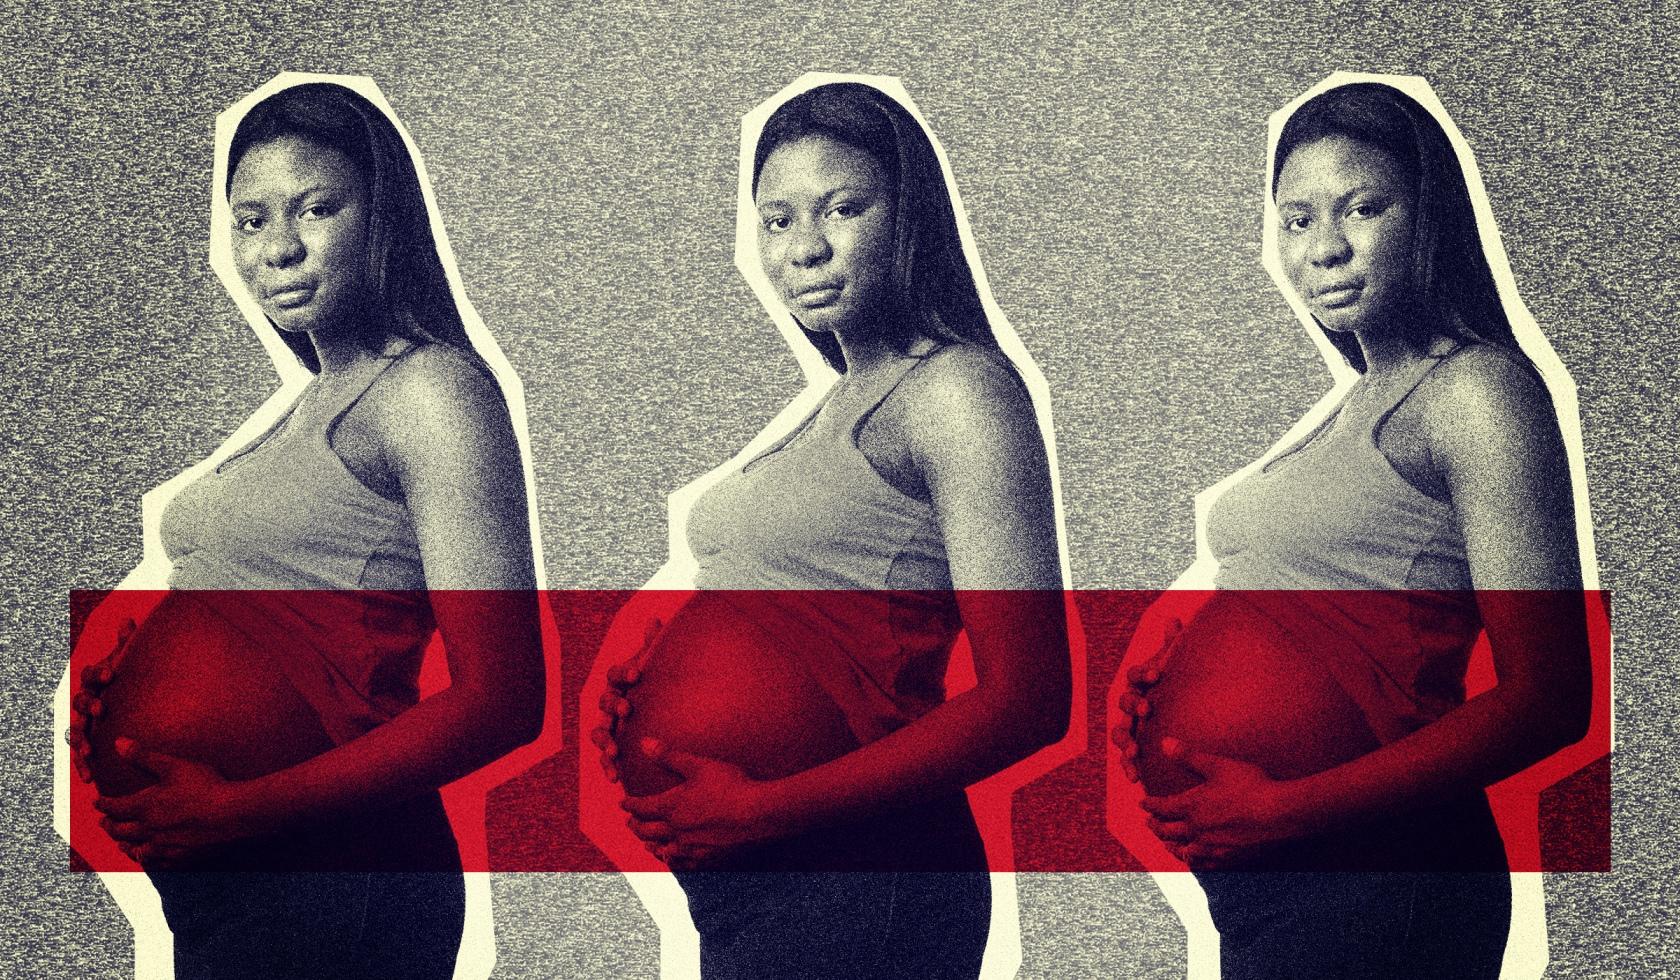 Black, Hispanic Women Report More Pain Postpartum but Receive Less Opioid Medication